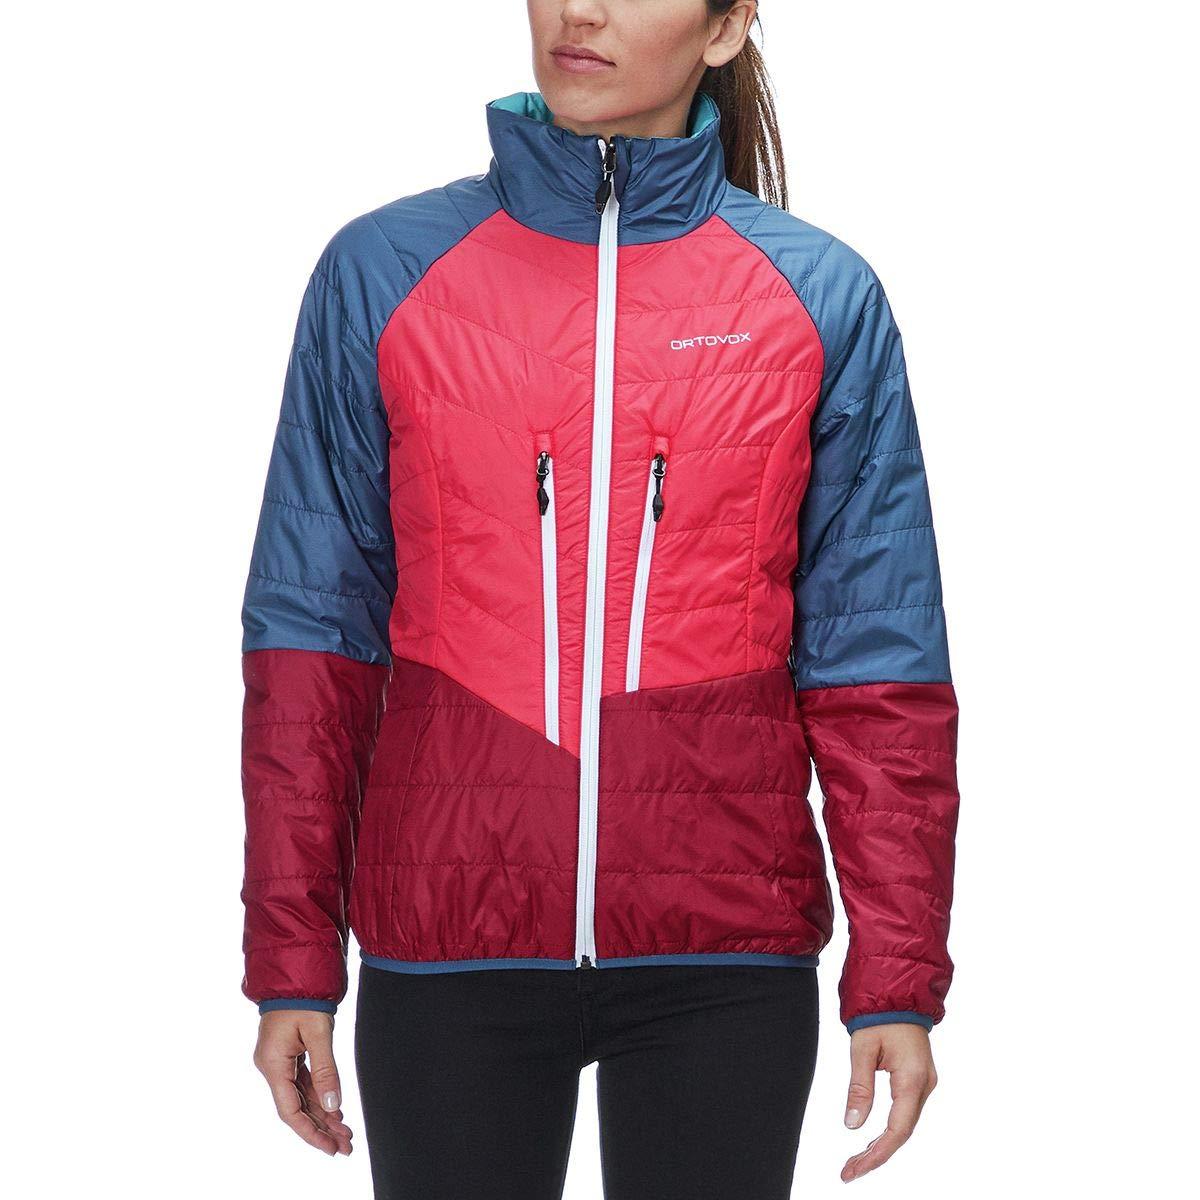 Ortovox Women's Piz Bial Jacket Aqua Blend XS